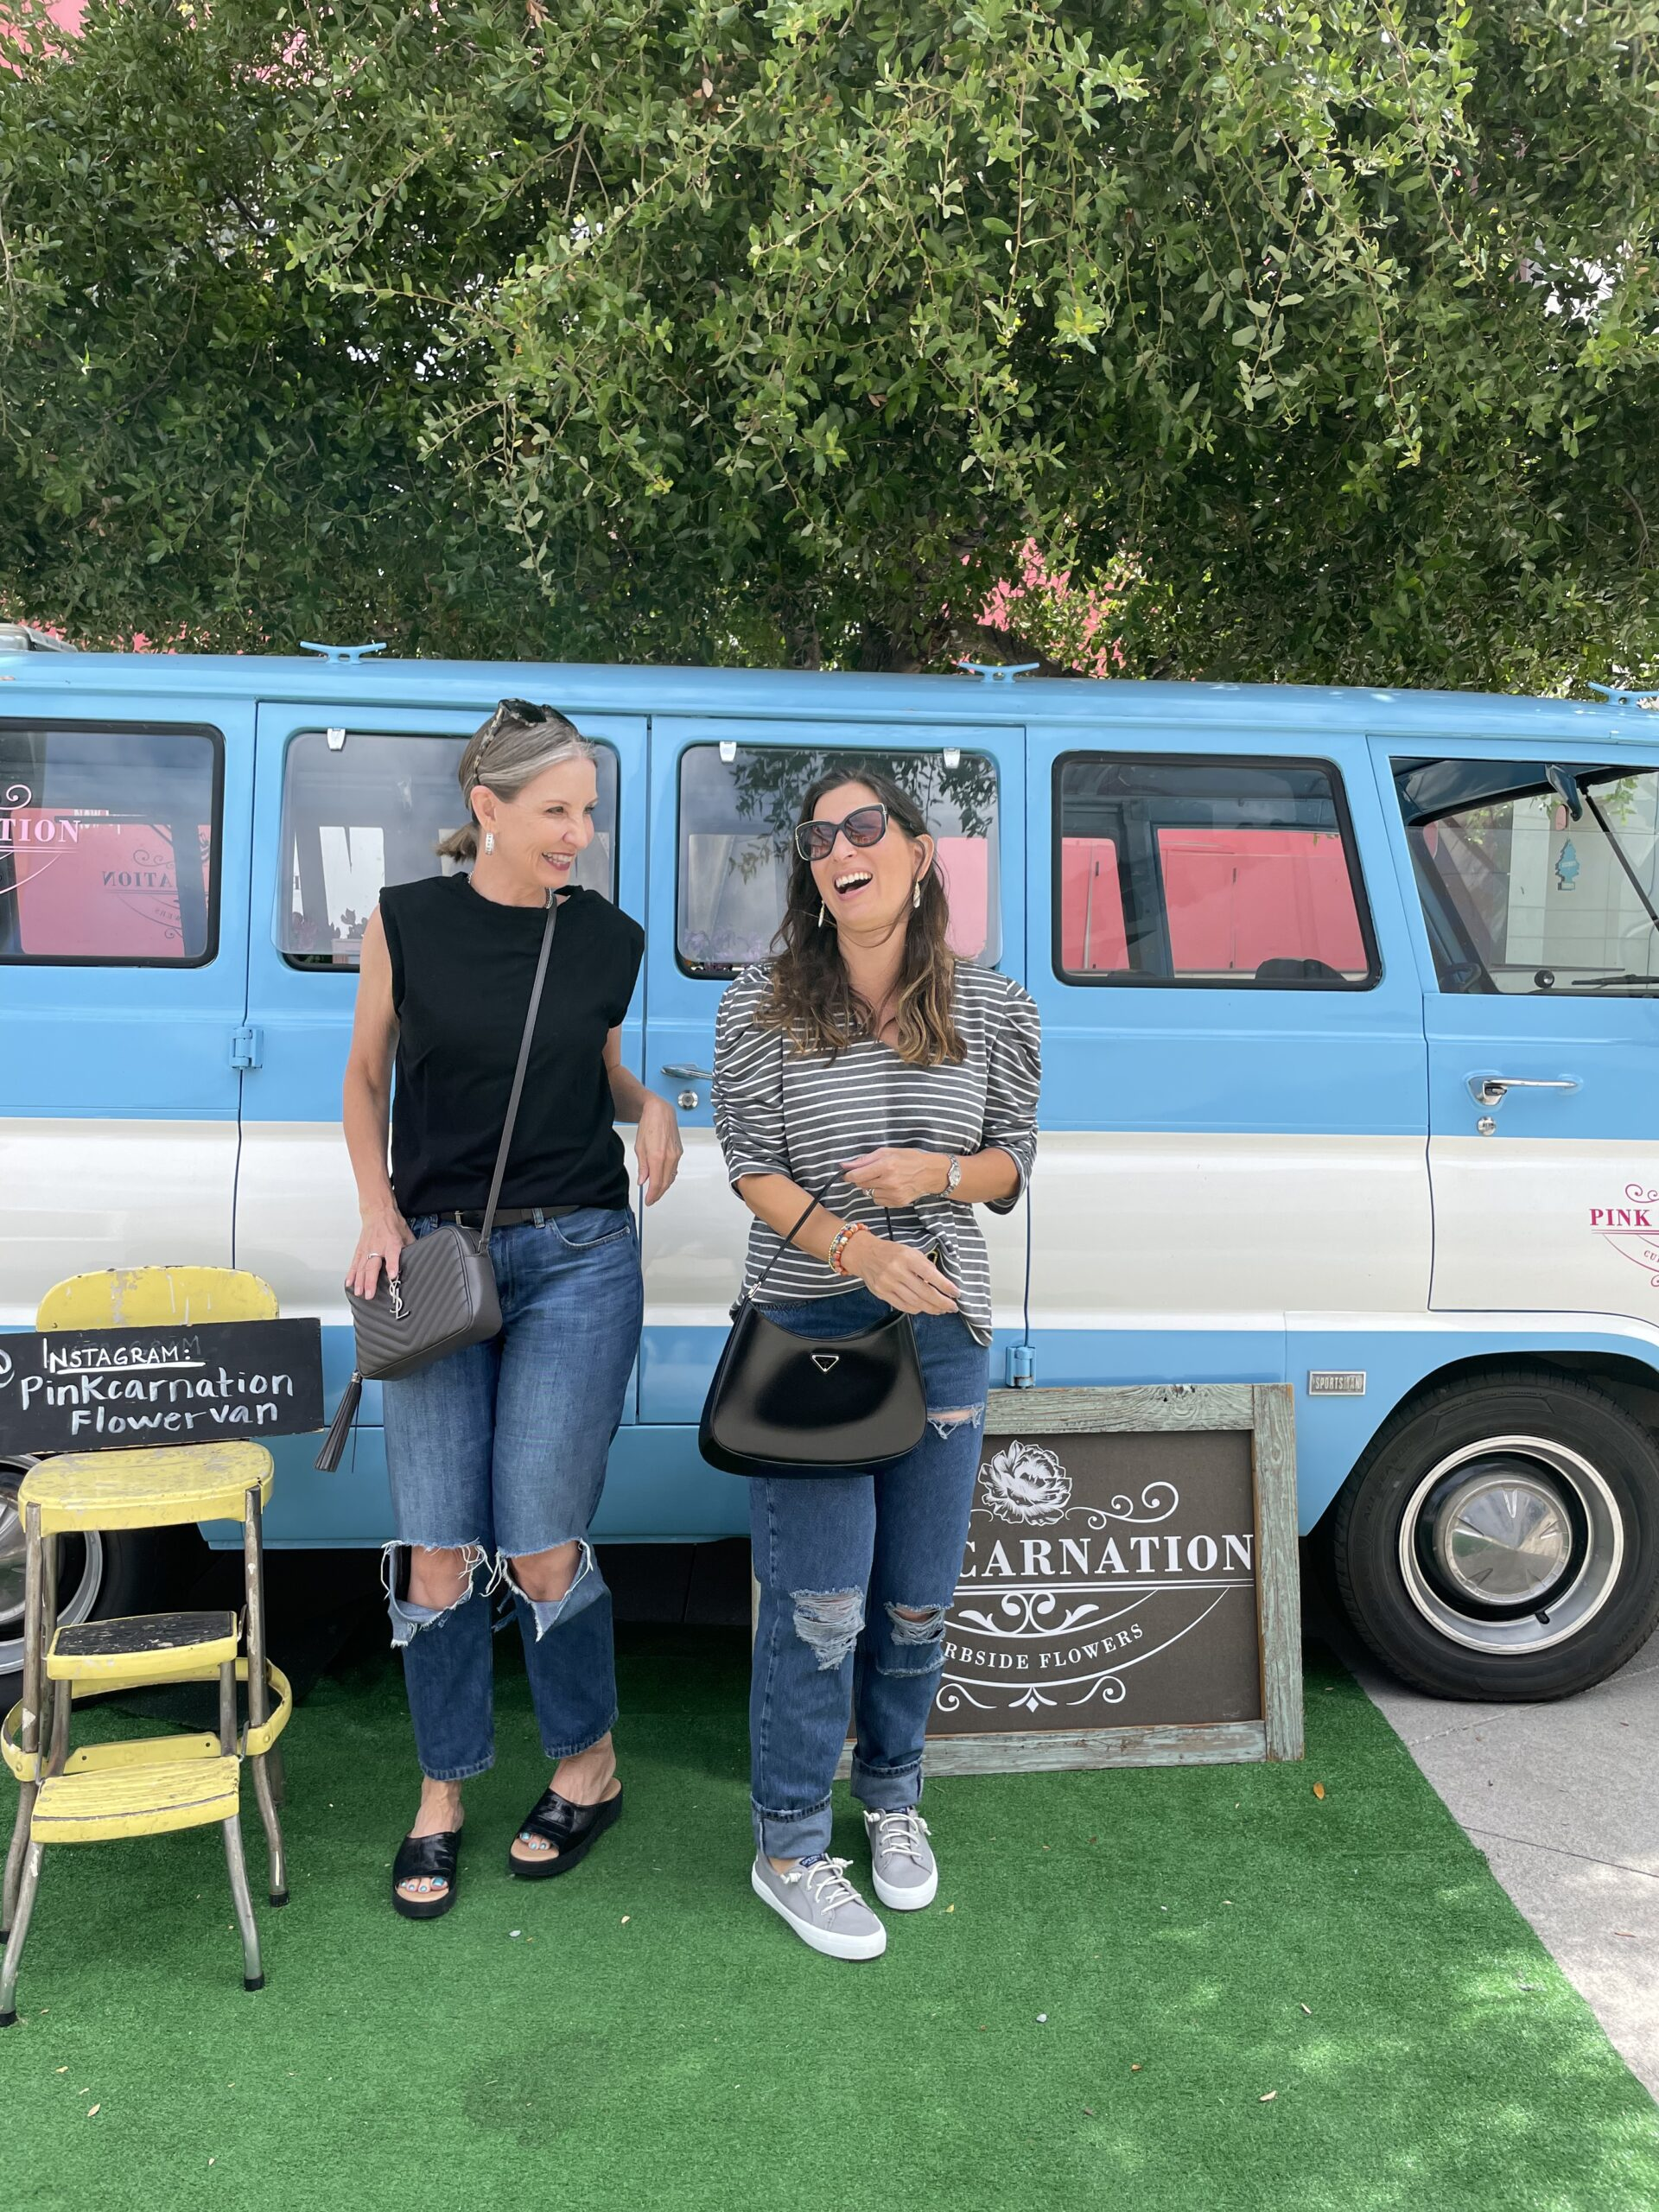 San Francisco Bay Area style bloggers